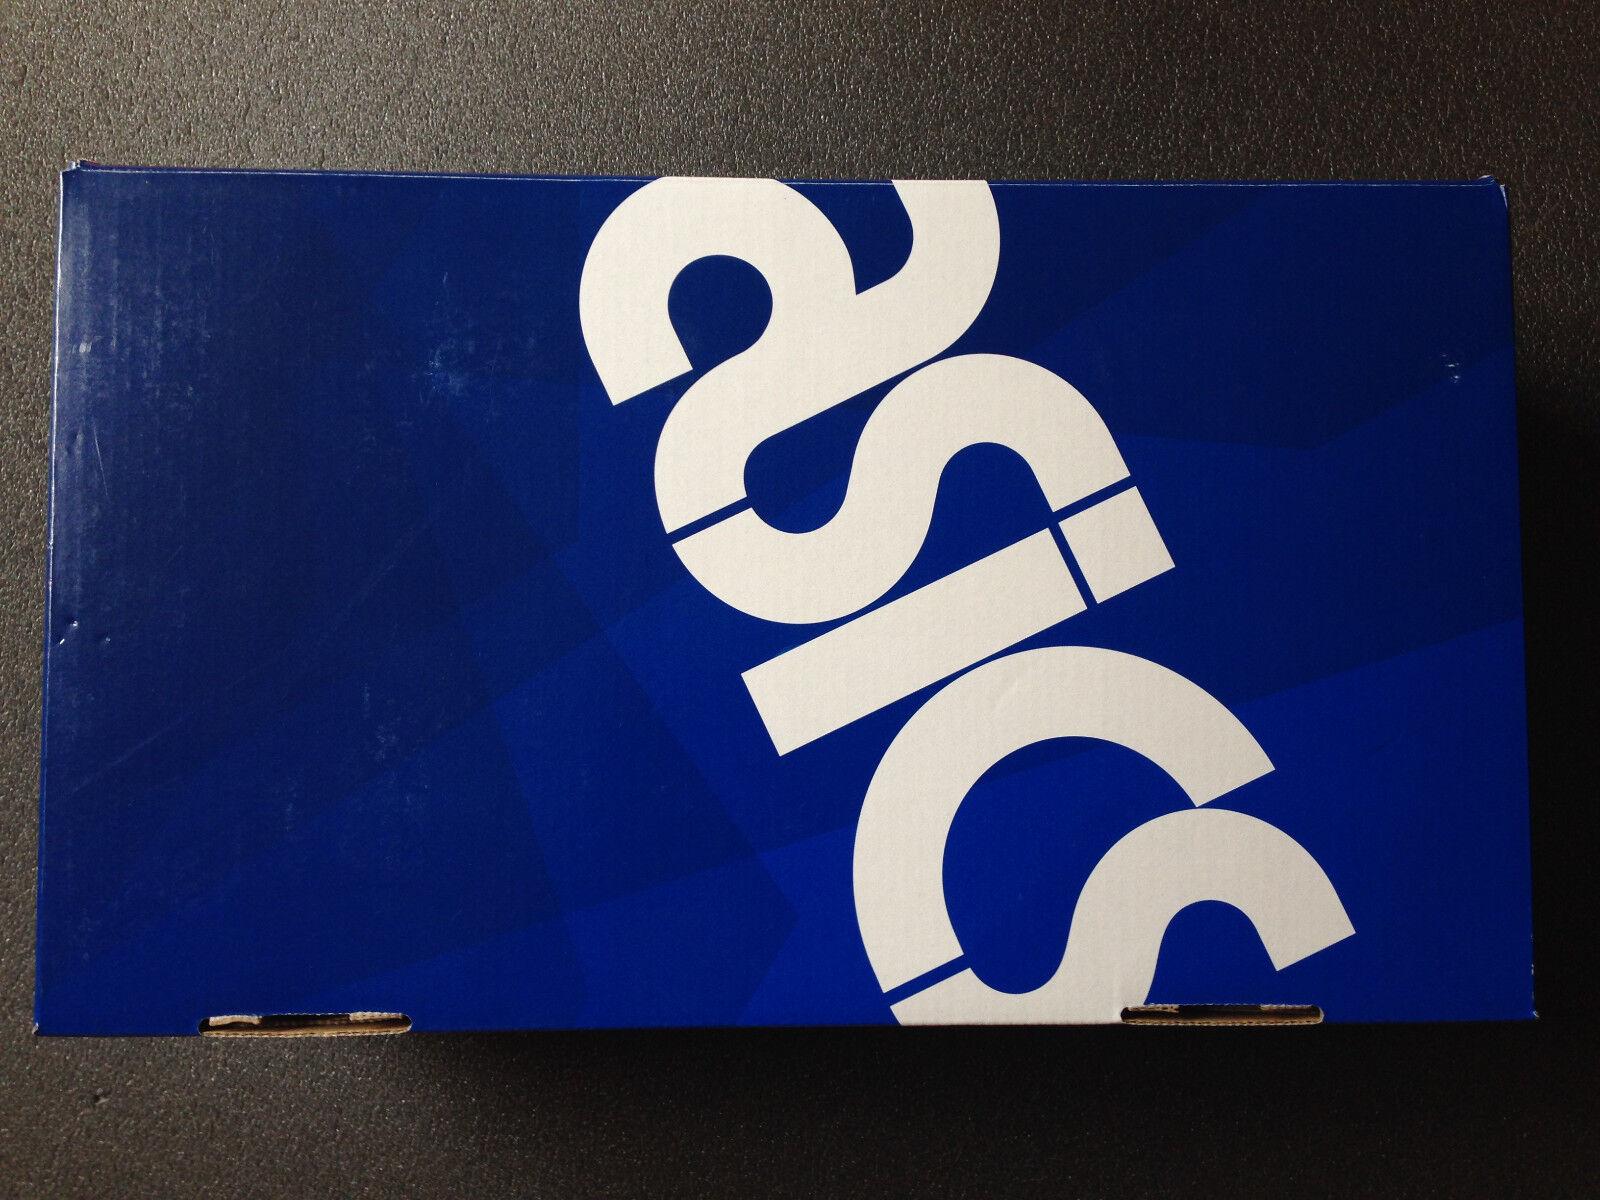 Asics Gel-Lyte OG vintage colourway colourway vintage GEL LYTE new in box US 12,5 UK 11,5 EUR 47 c4002e